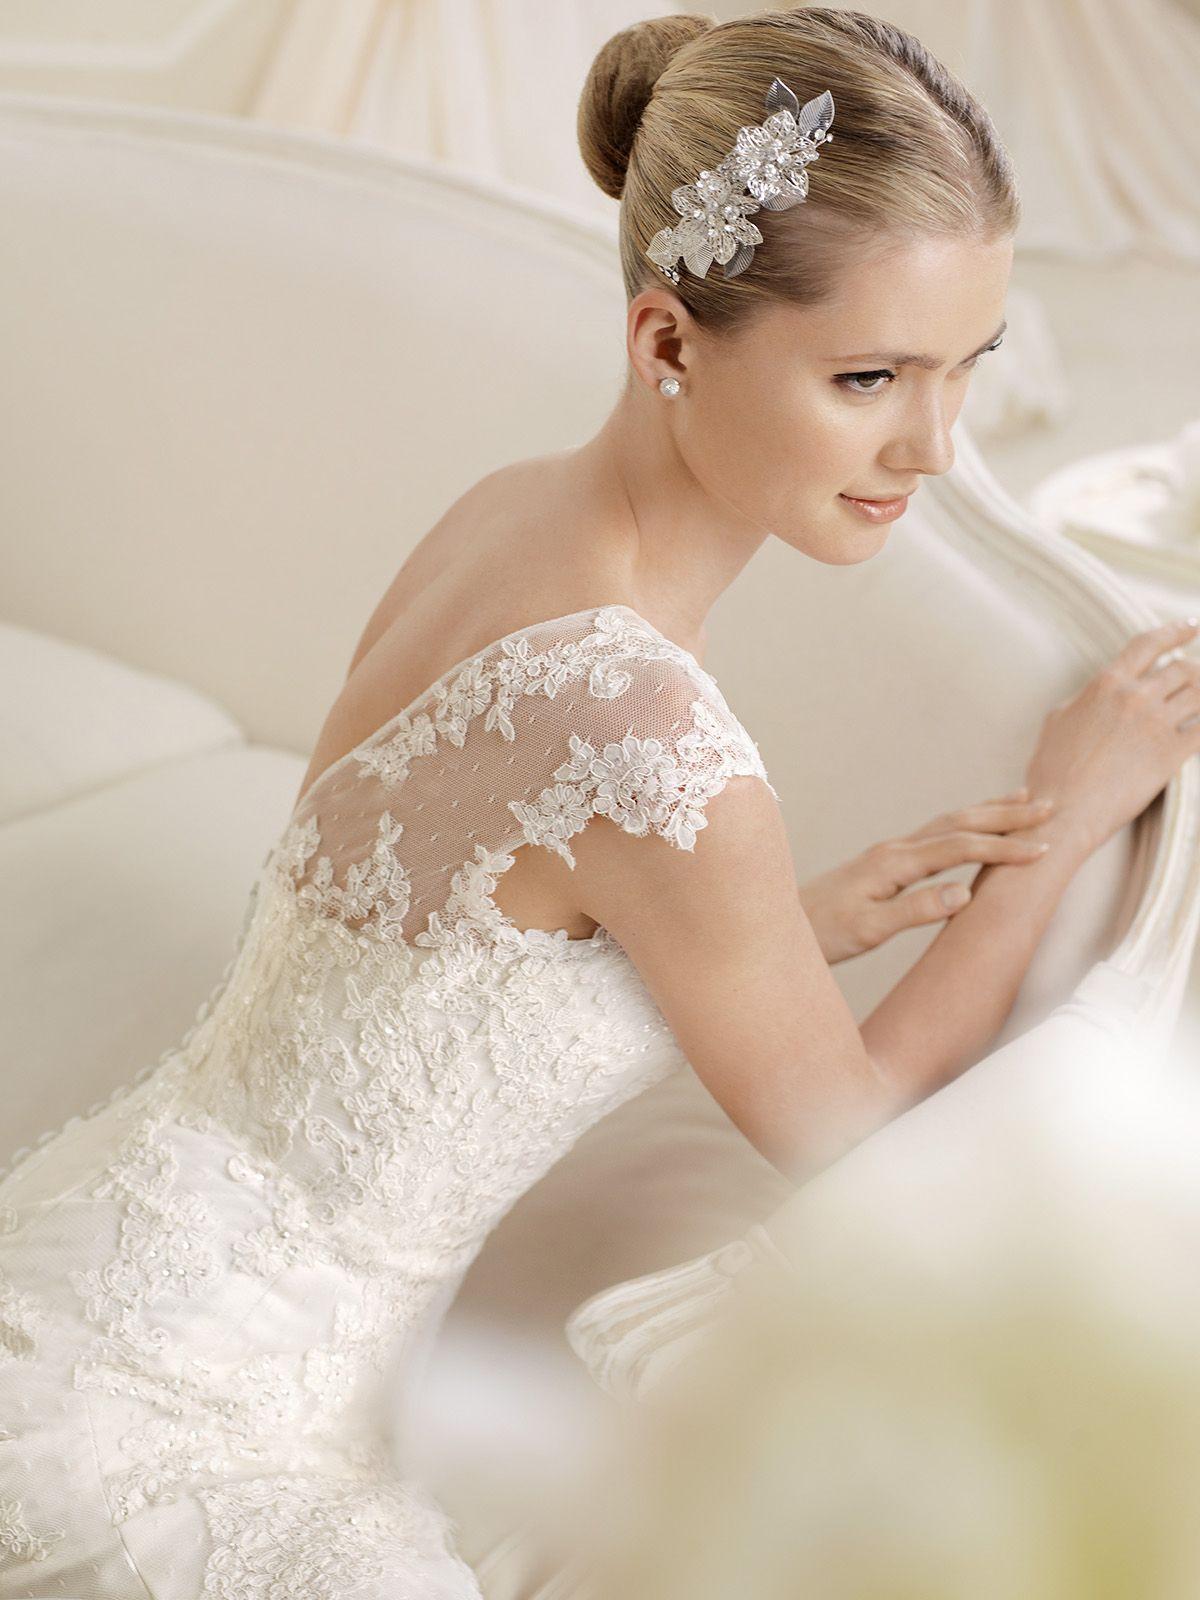 Unique Boat Neckline Fitted La Sposa Wedding Dress Idalis DimitraDesigns